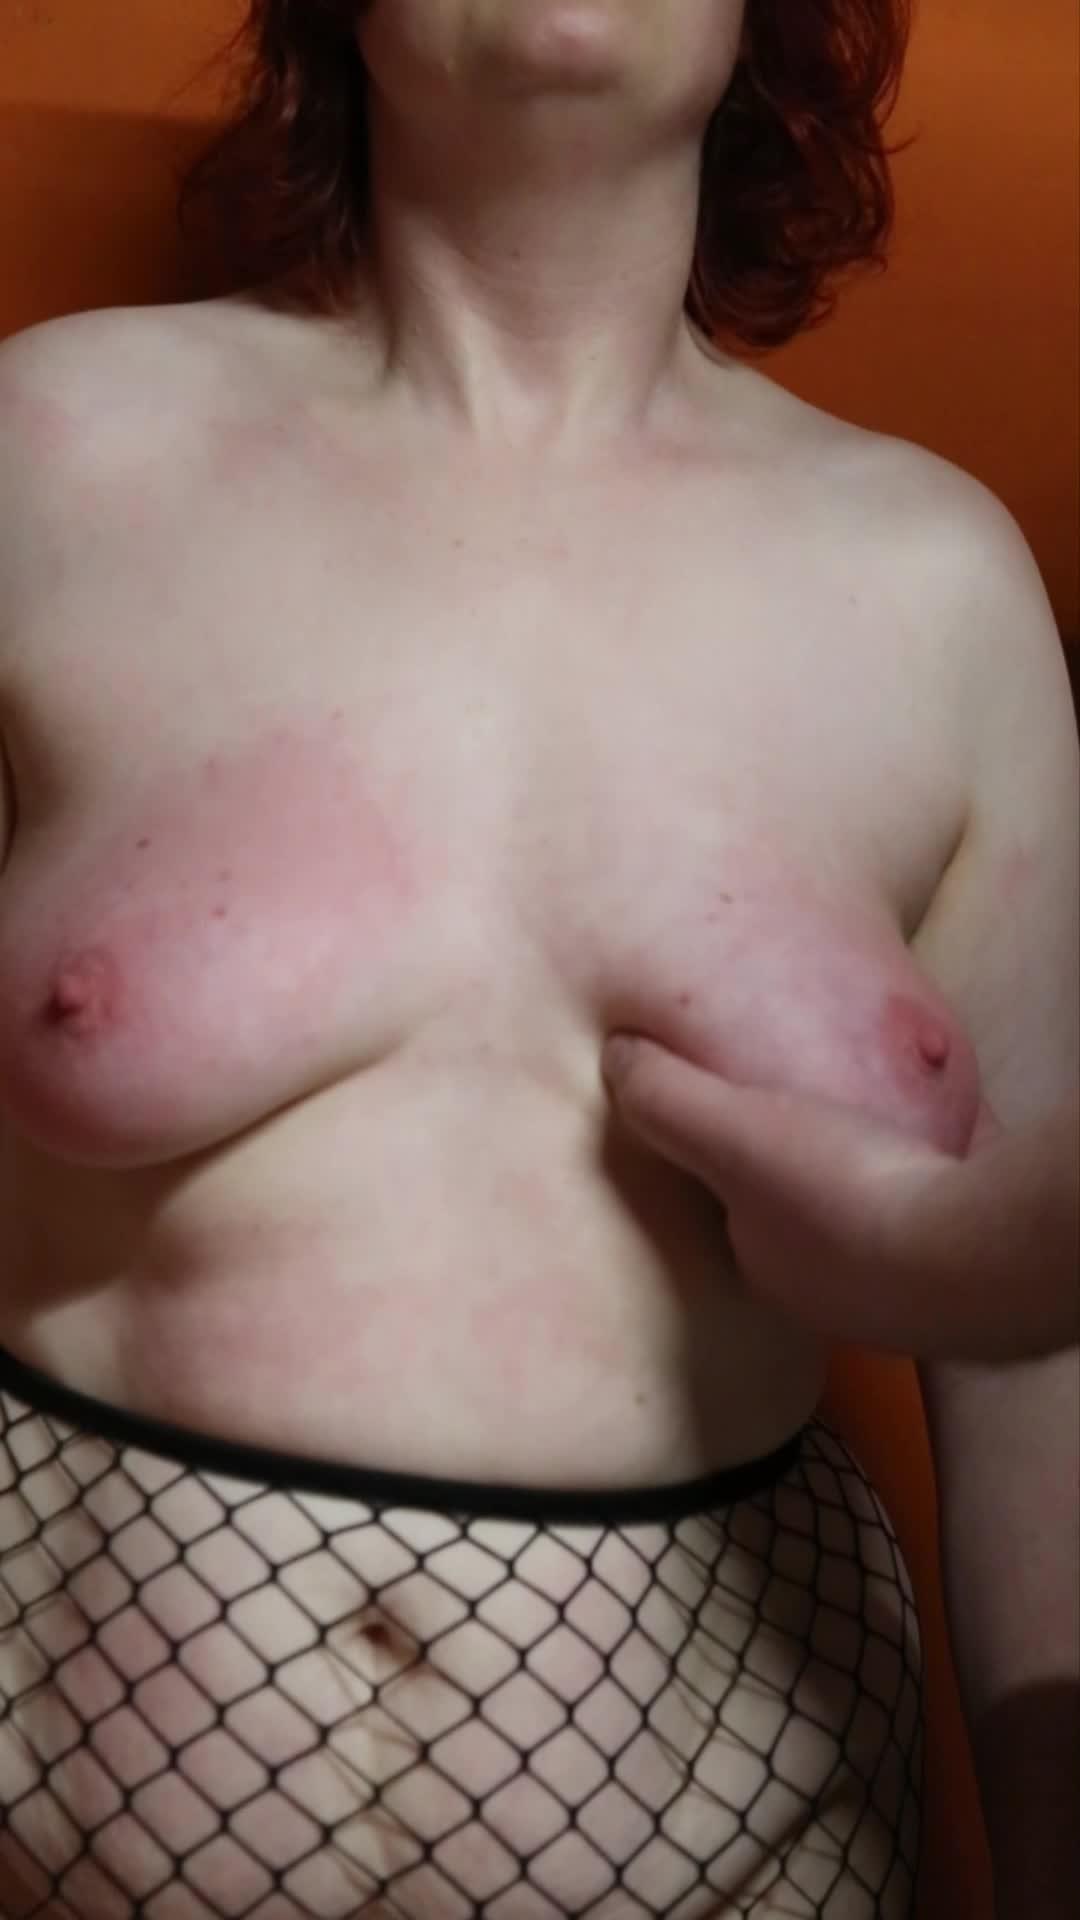 Titten Boxen - Shortclip Tit Punching